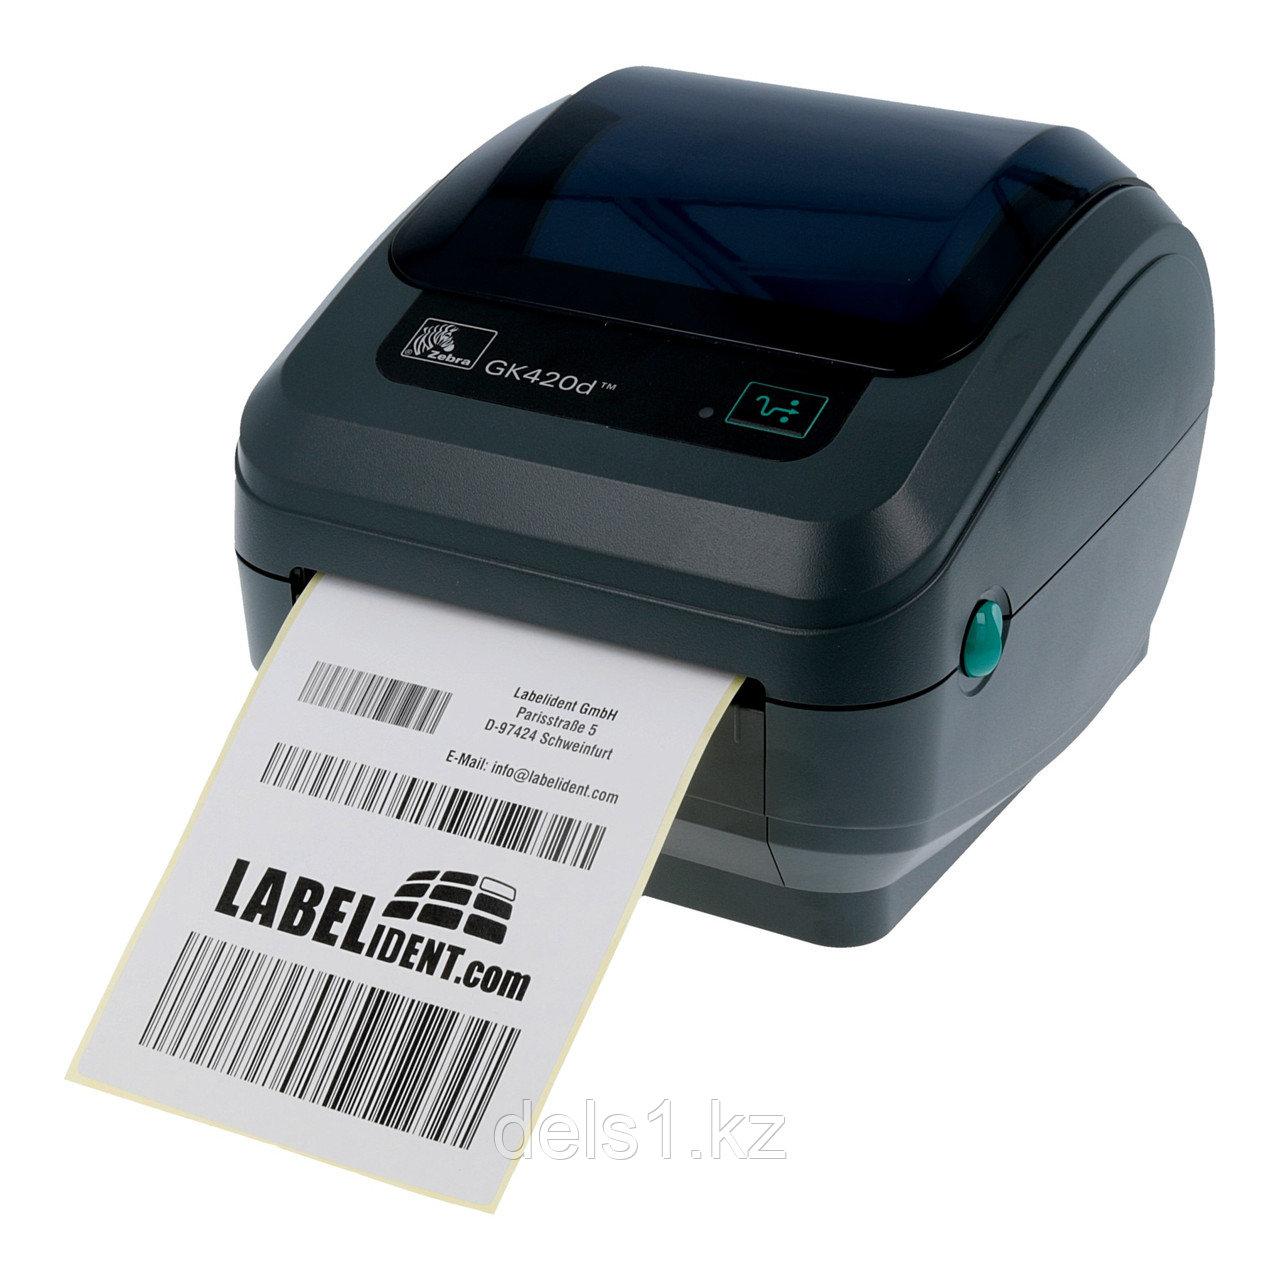 Термо-принтер этикеток Zebra GK420d